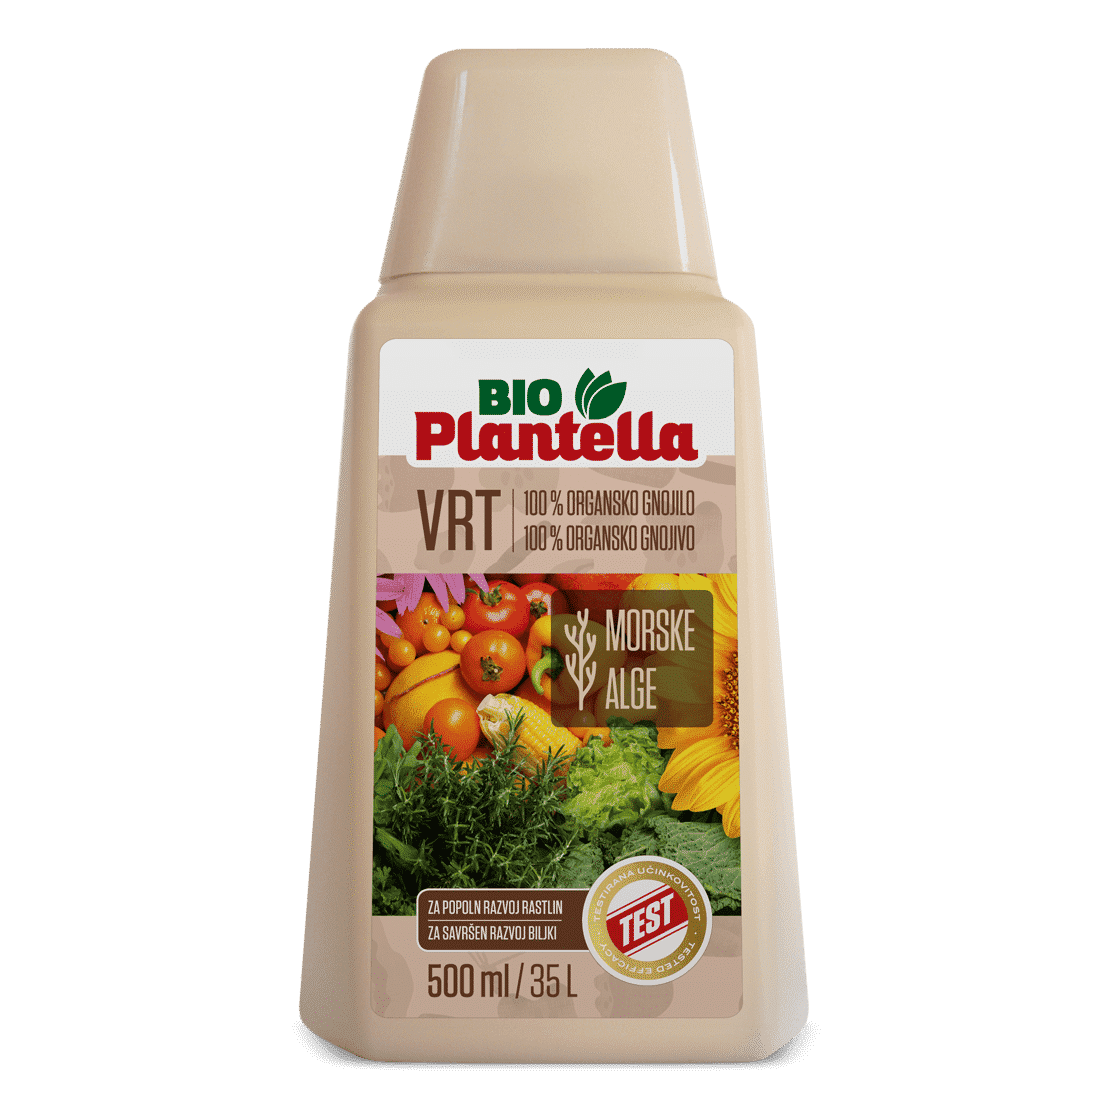 Bio-Plantella_Vrt_500ml_SI-HR